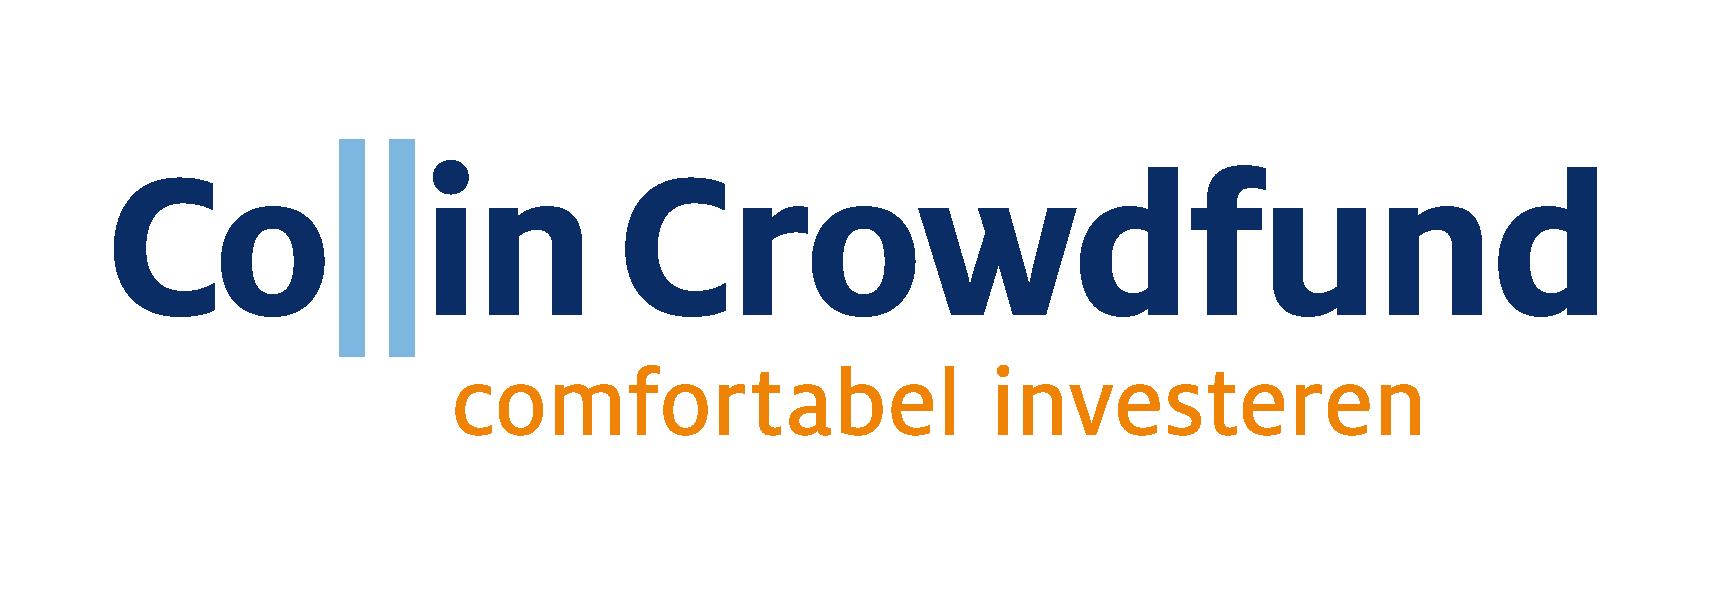 Collin crowdfund logo.png